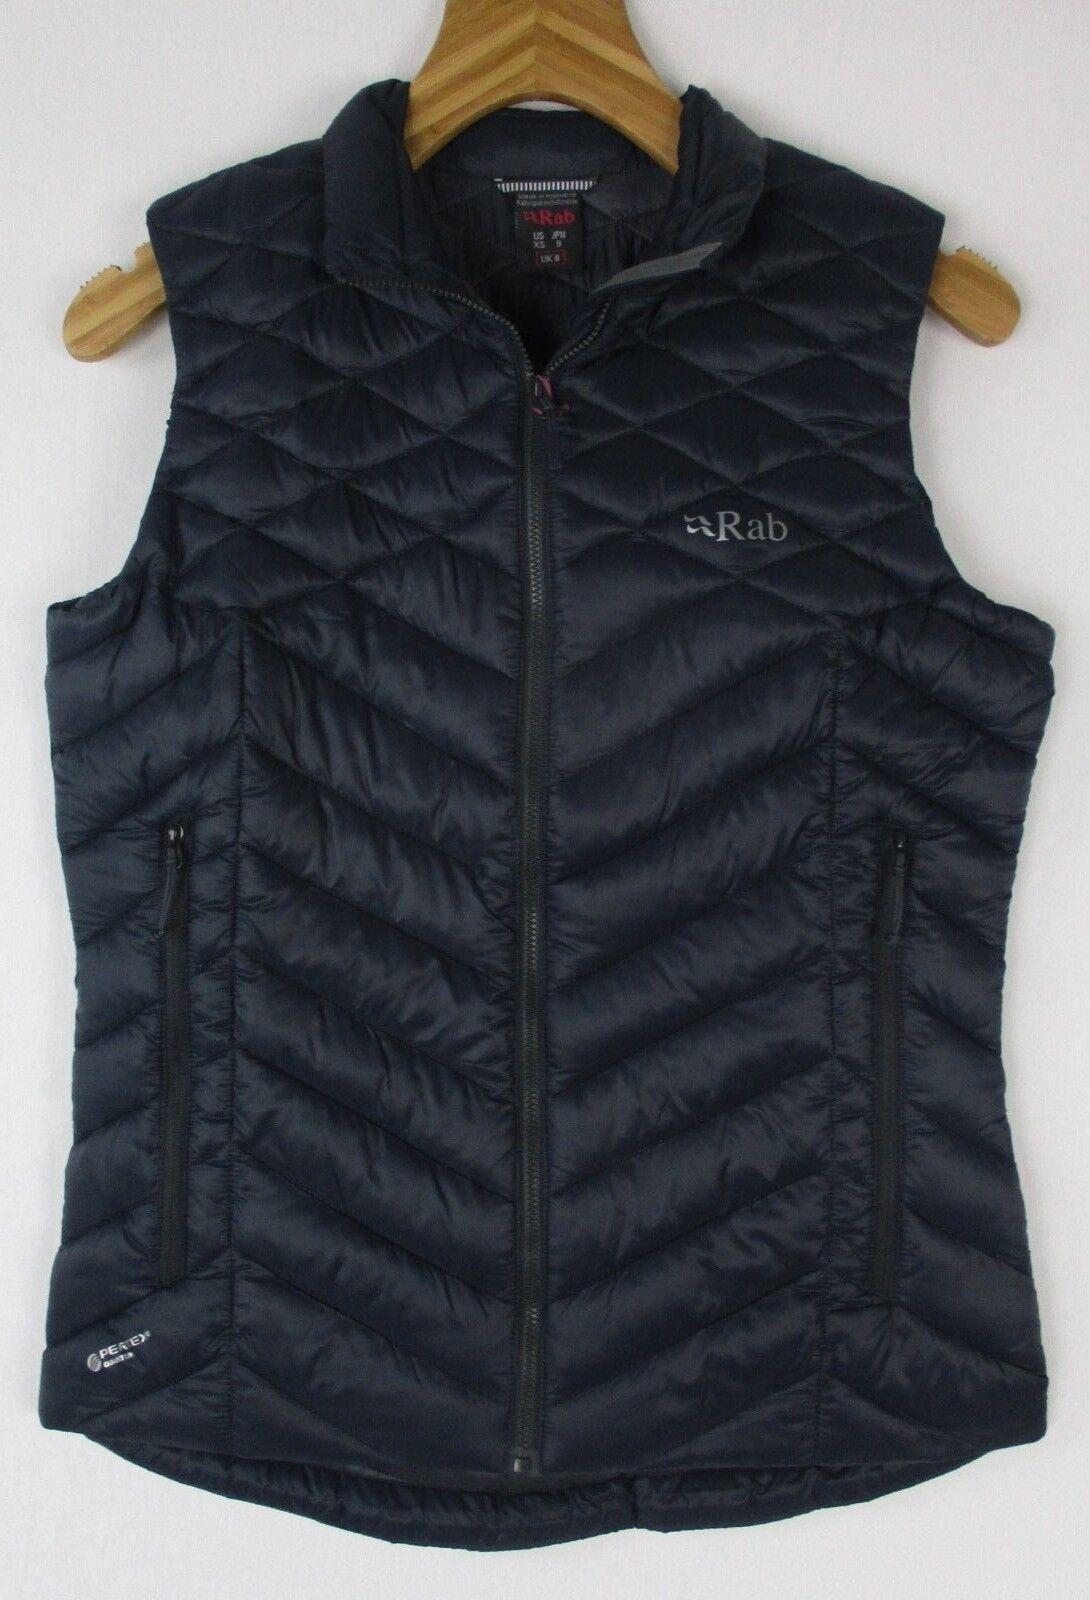 Rab Women's Altus Vest QIO-41 Beluga Steel Size Small